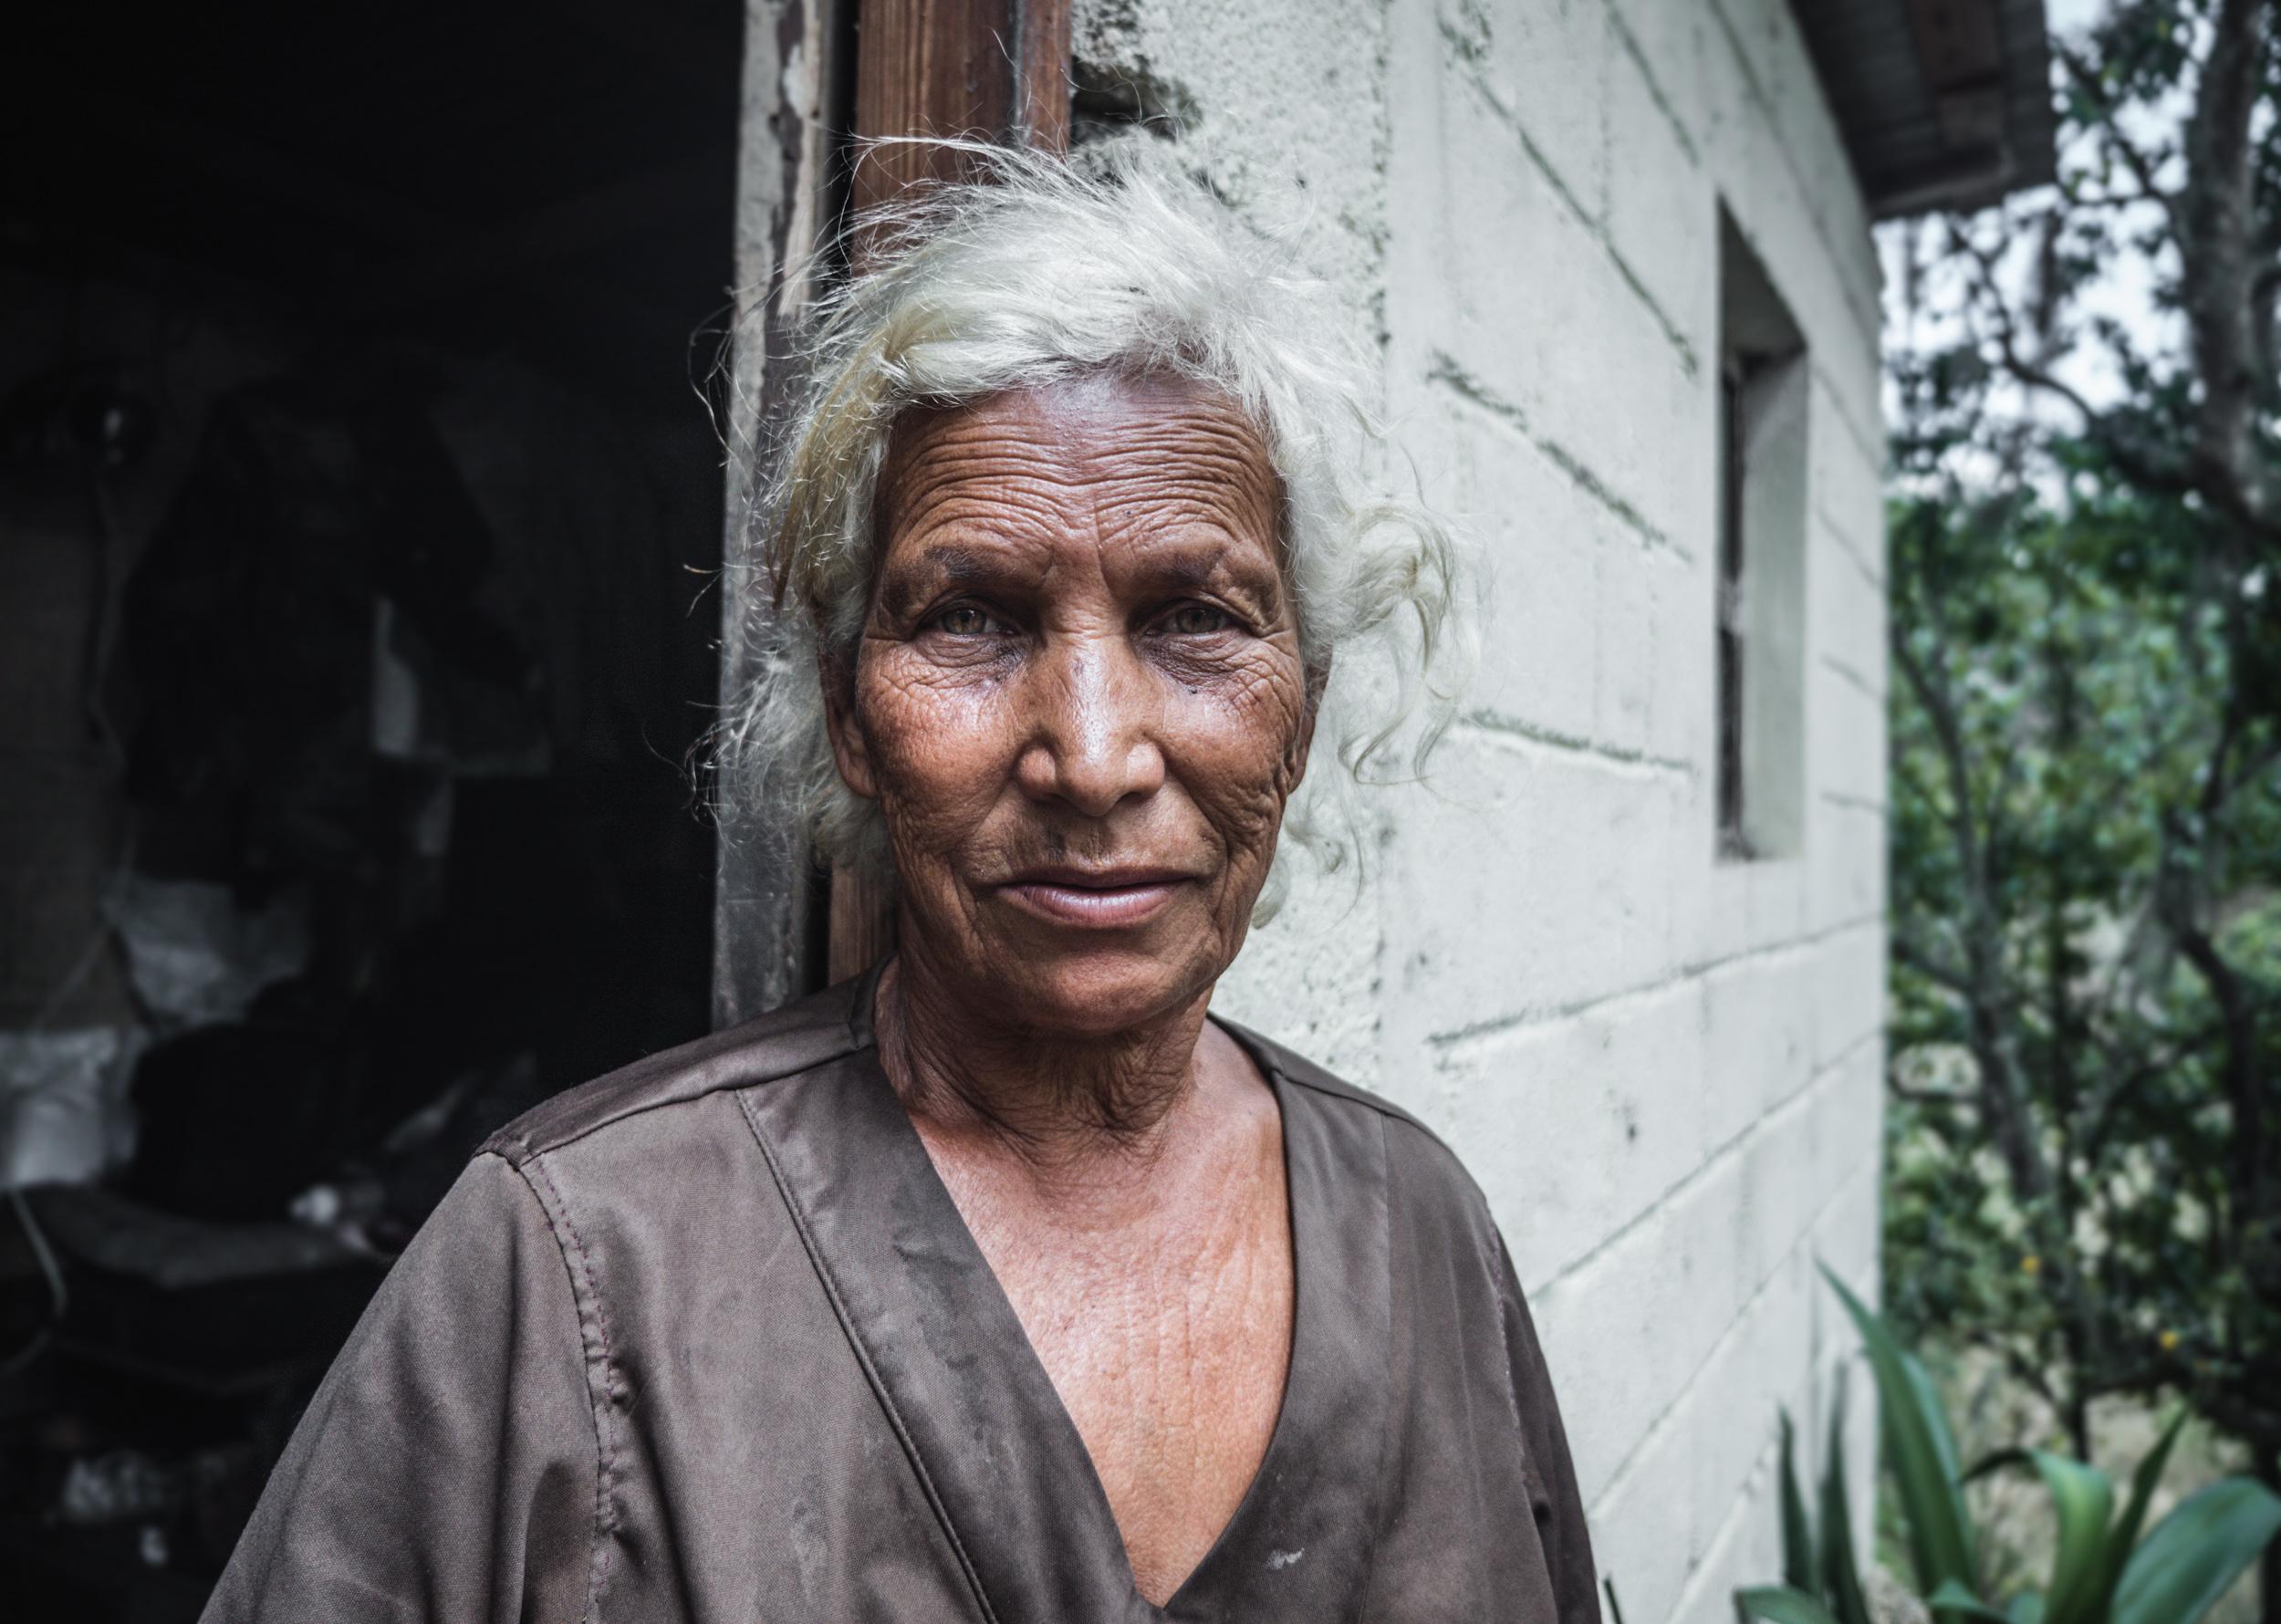 _19 Elderly woman Santa Cristobal Dominican Republic.jpg